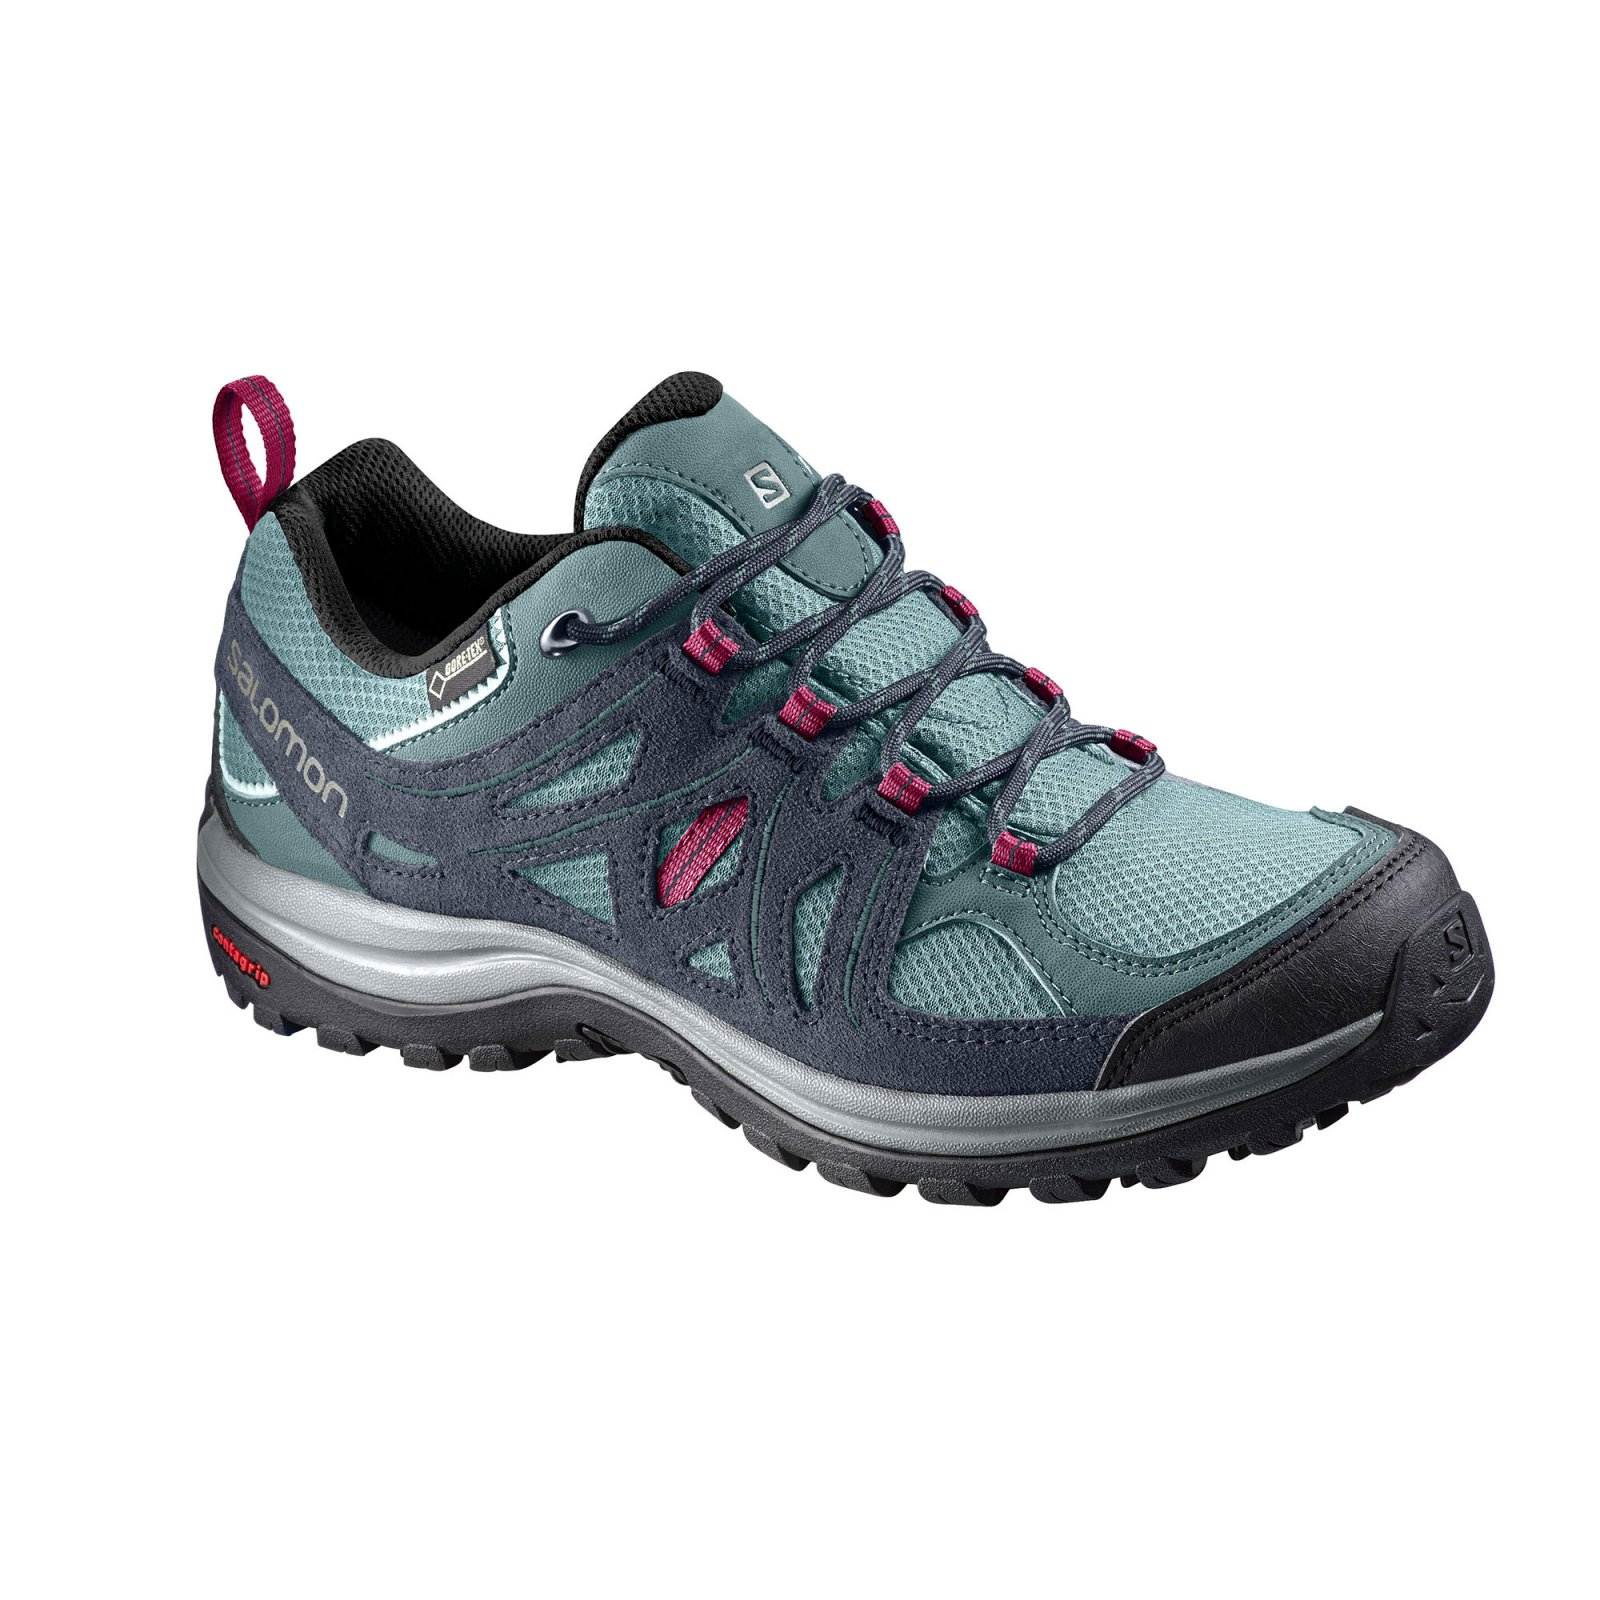 ac62b5551a96 Outdoorové boty Salomon Ellipse 2 GTX® W L39473100 - Actisport.cz